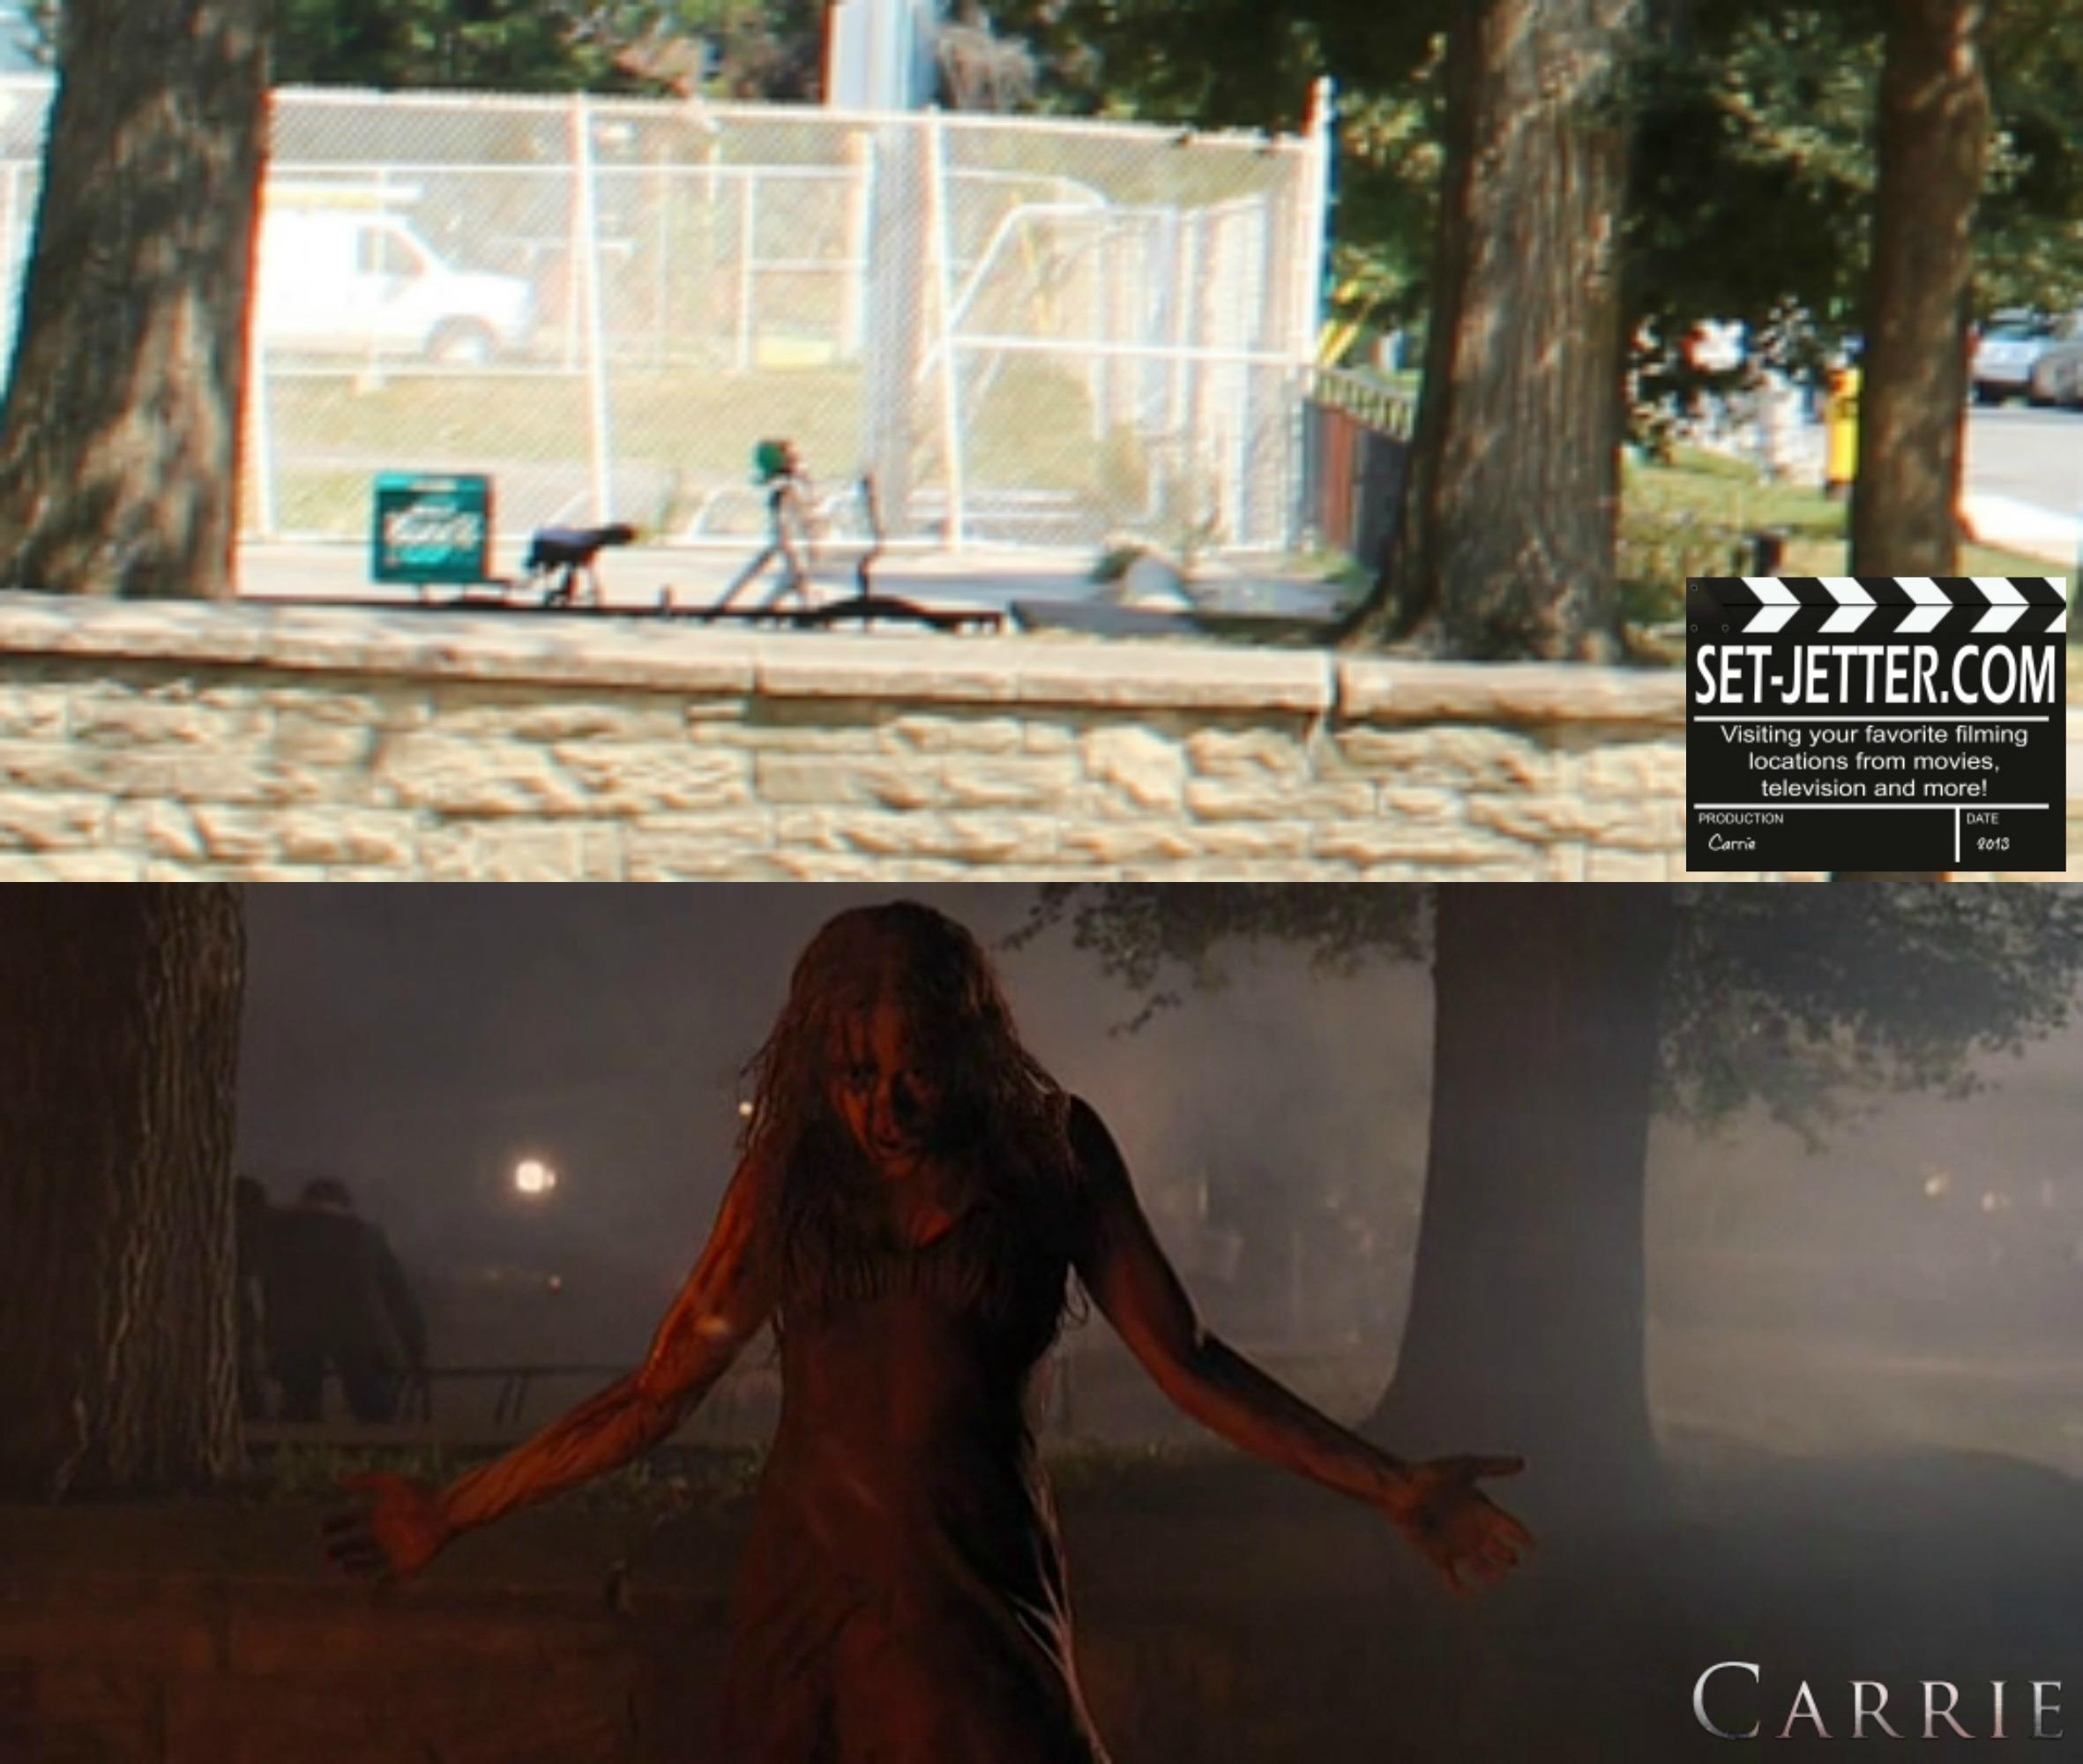 Carrie 2013 comparison 158.jpg